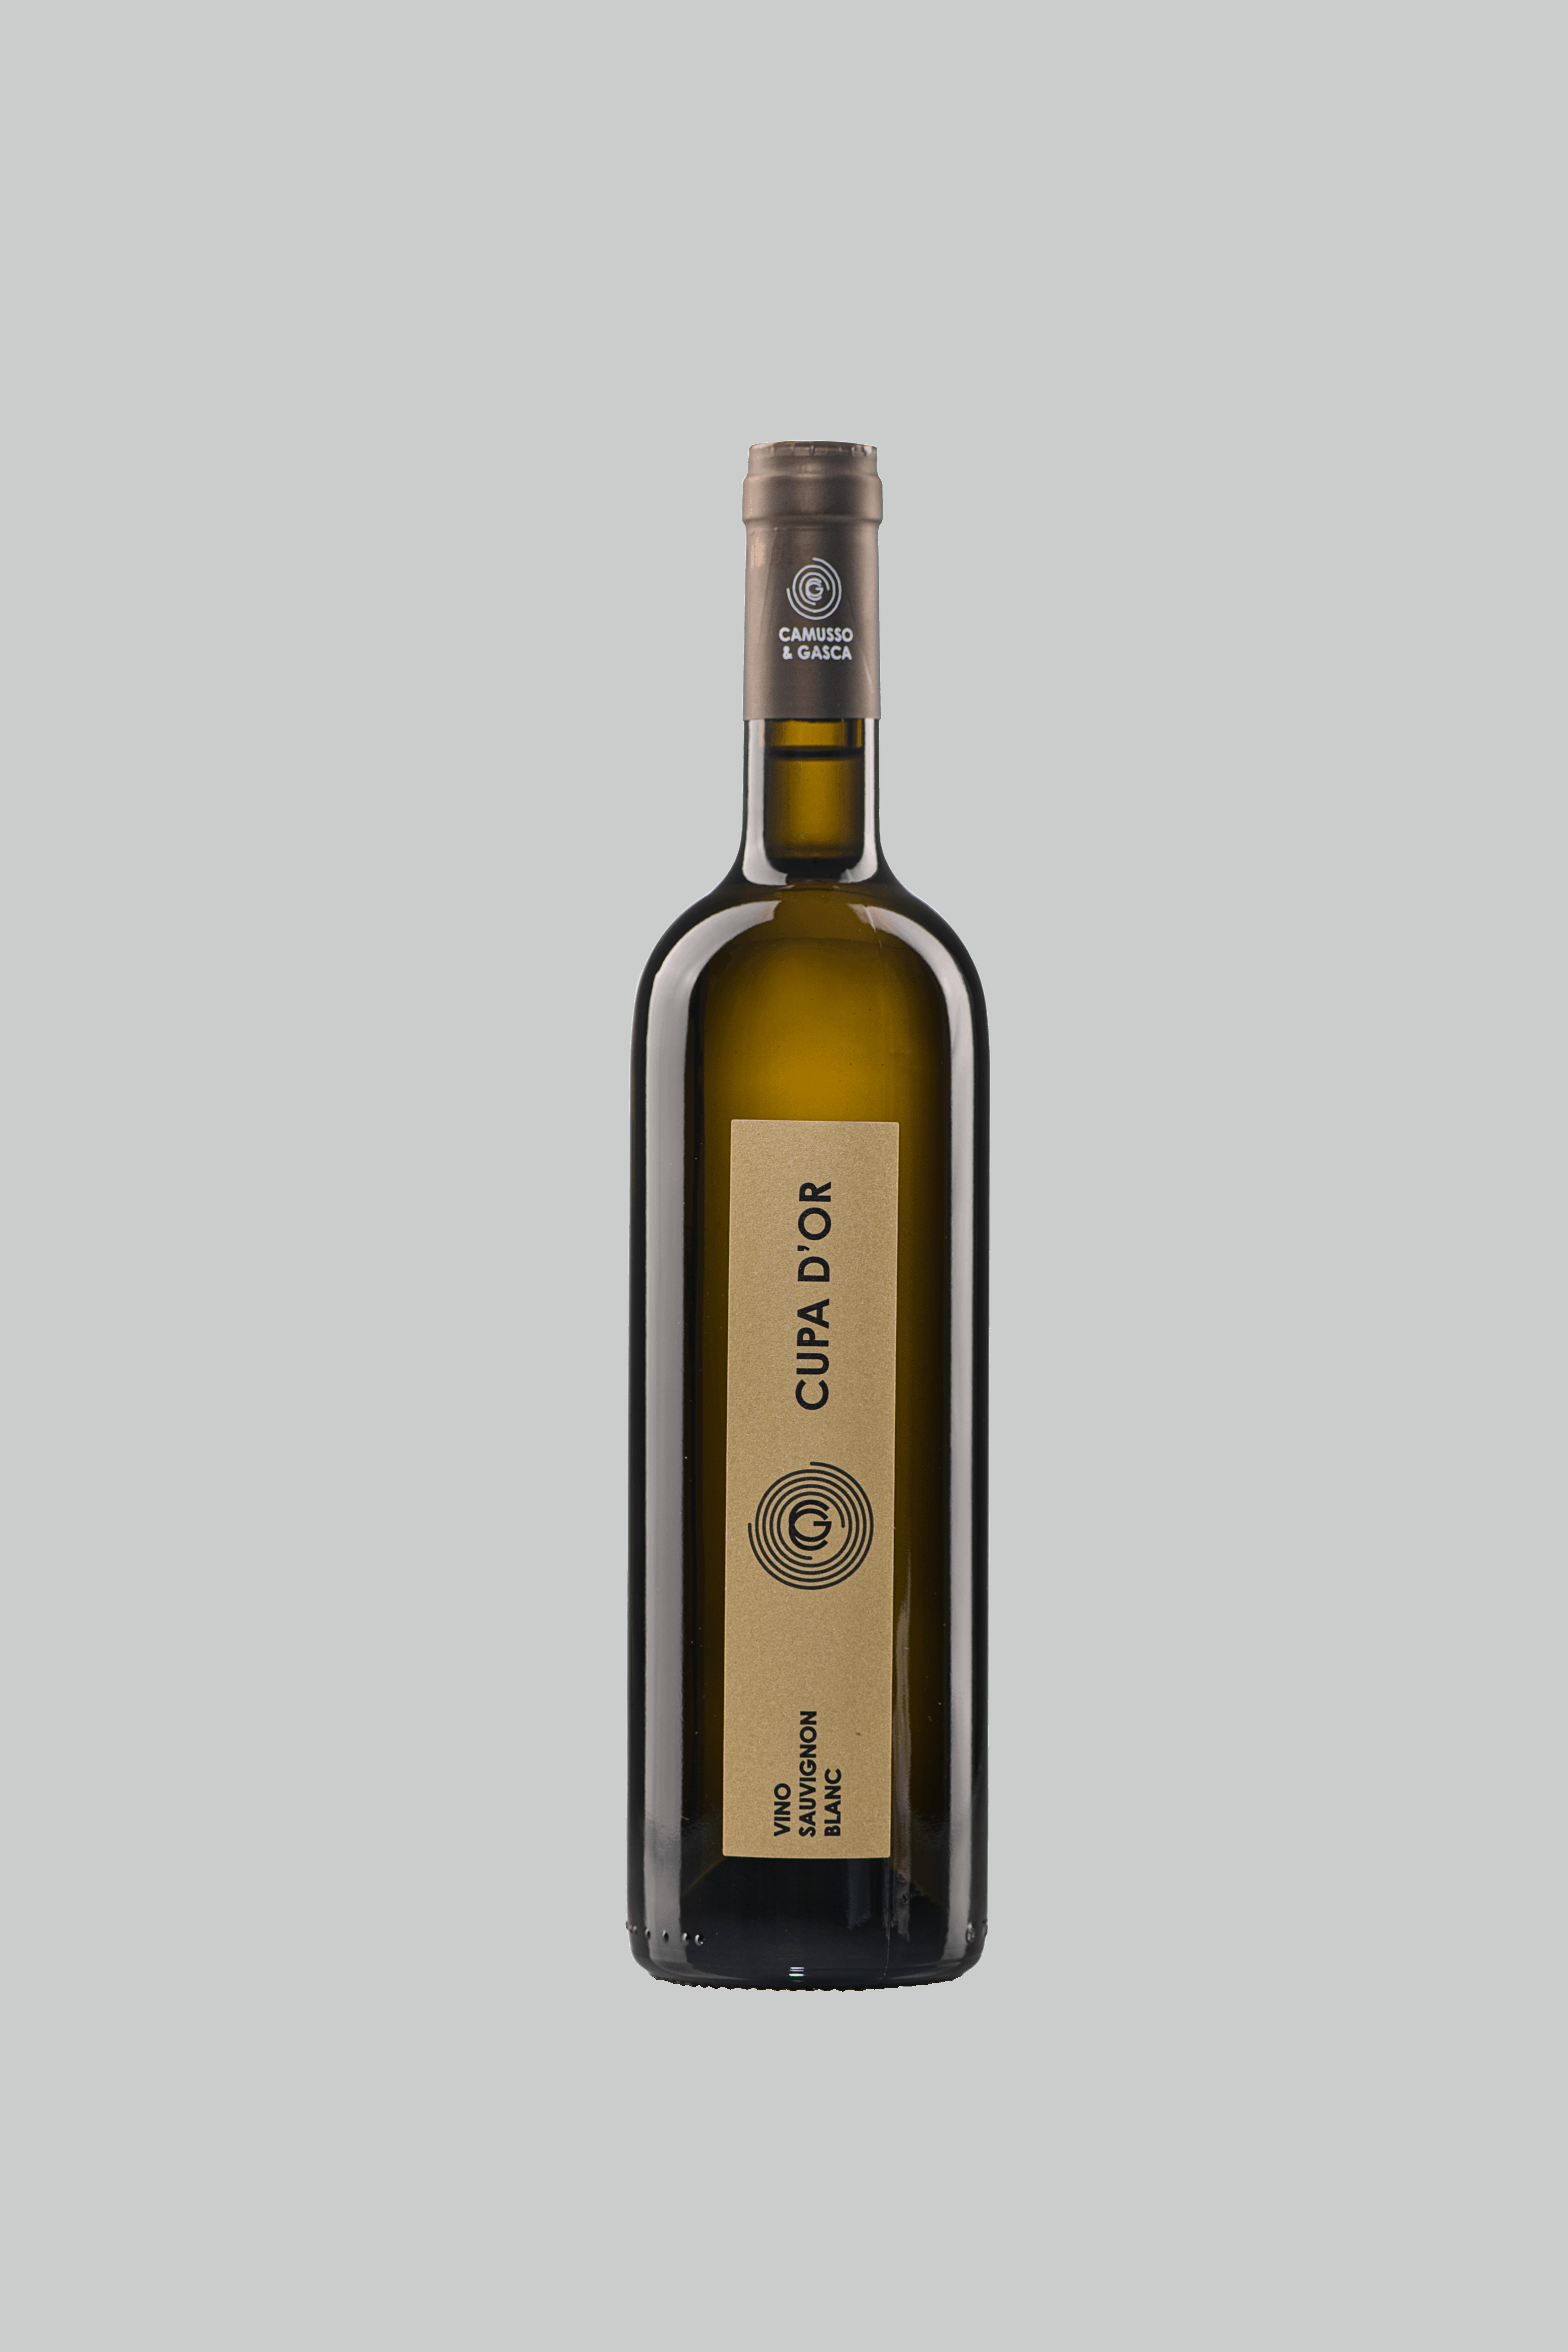 Cupa D'Or, Sauvignon Blanc